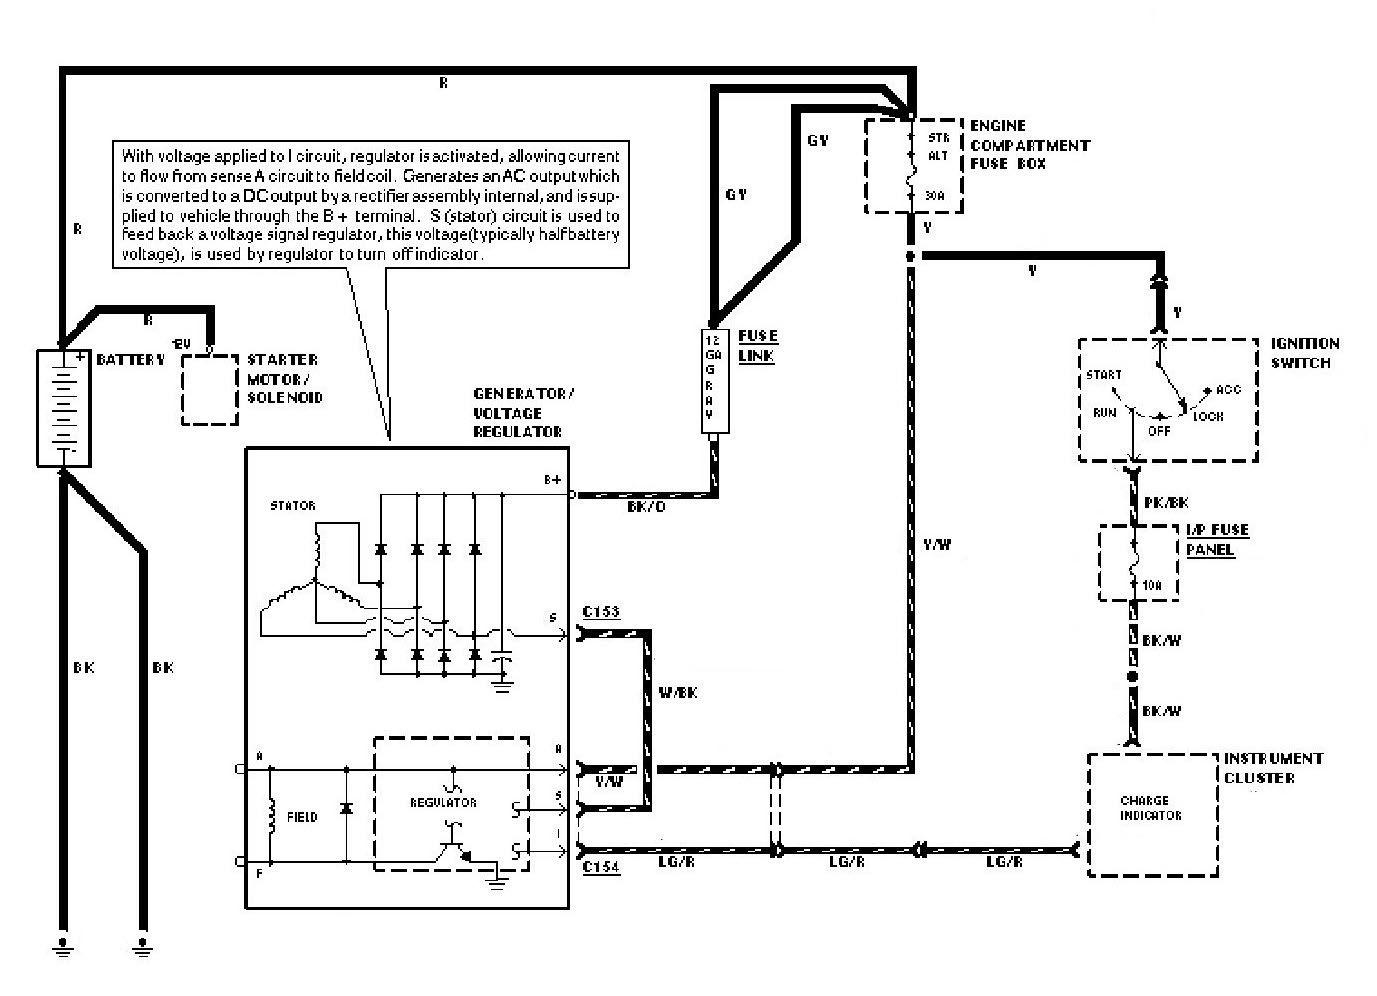 Wiring Diagram Internal Regulator Alternator | alternator | Pinterest